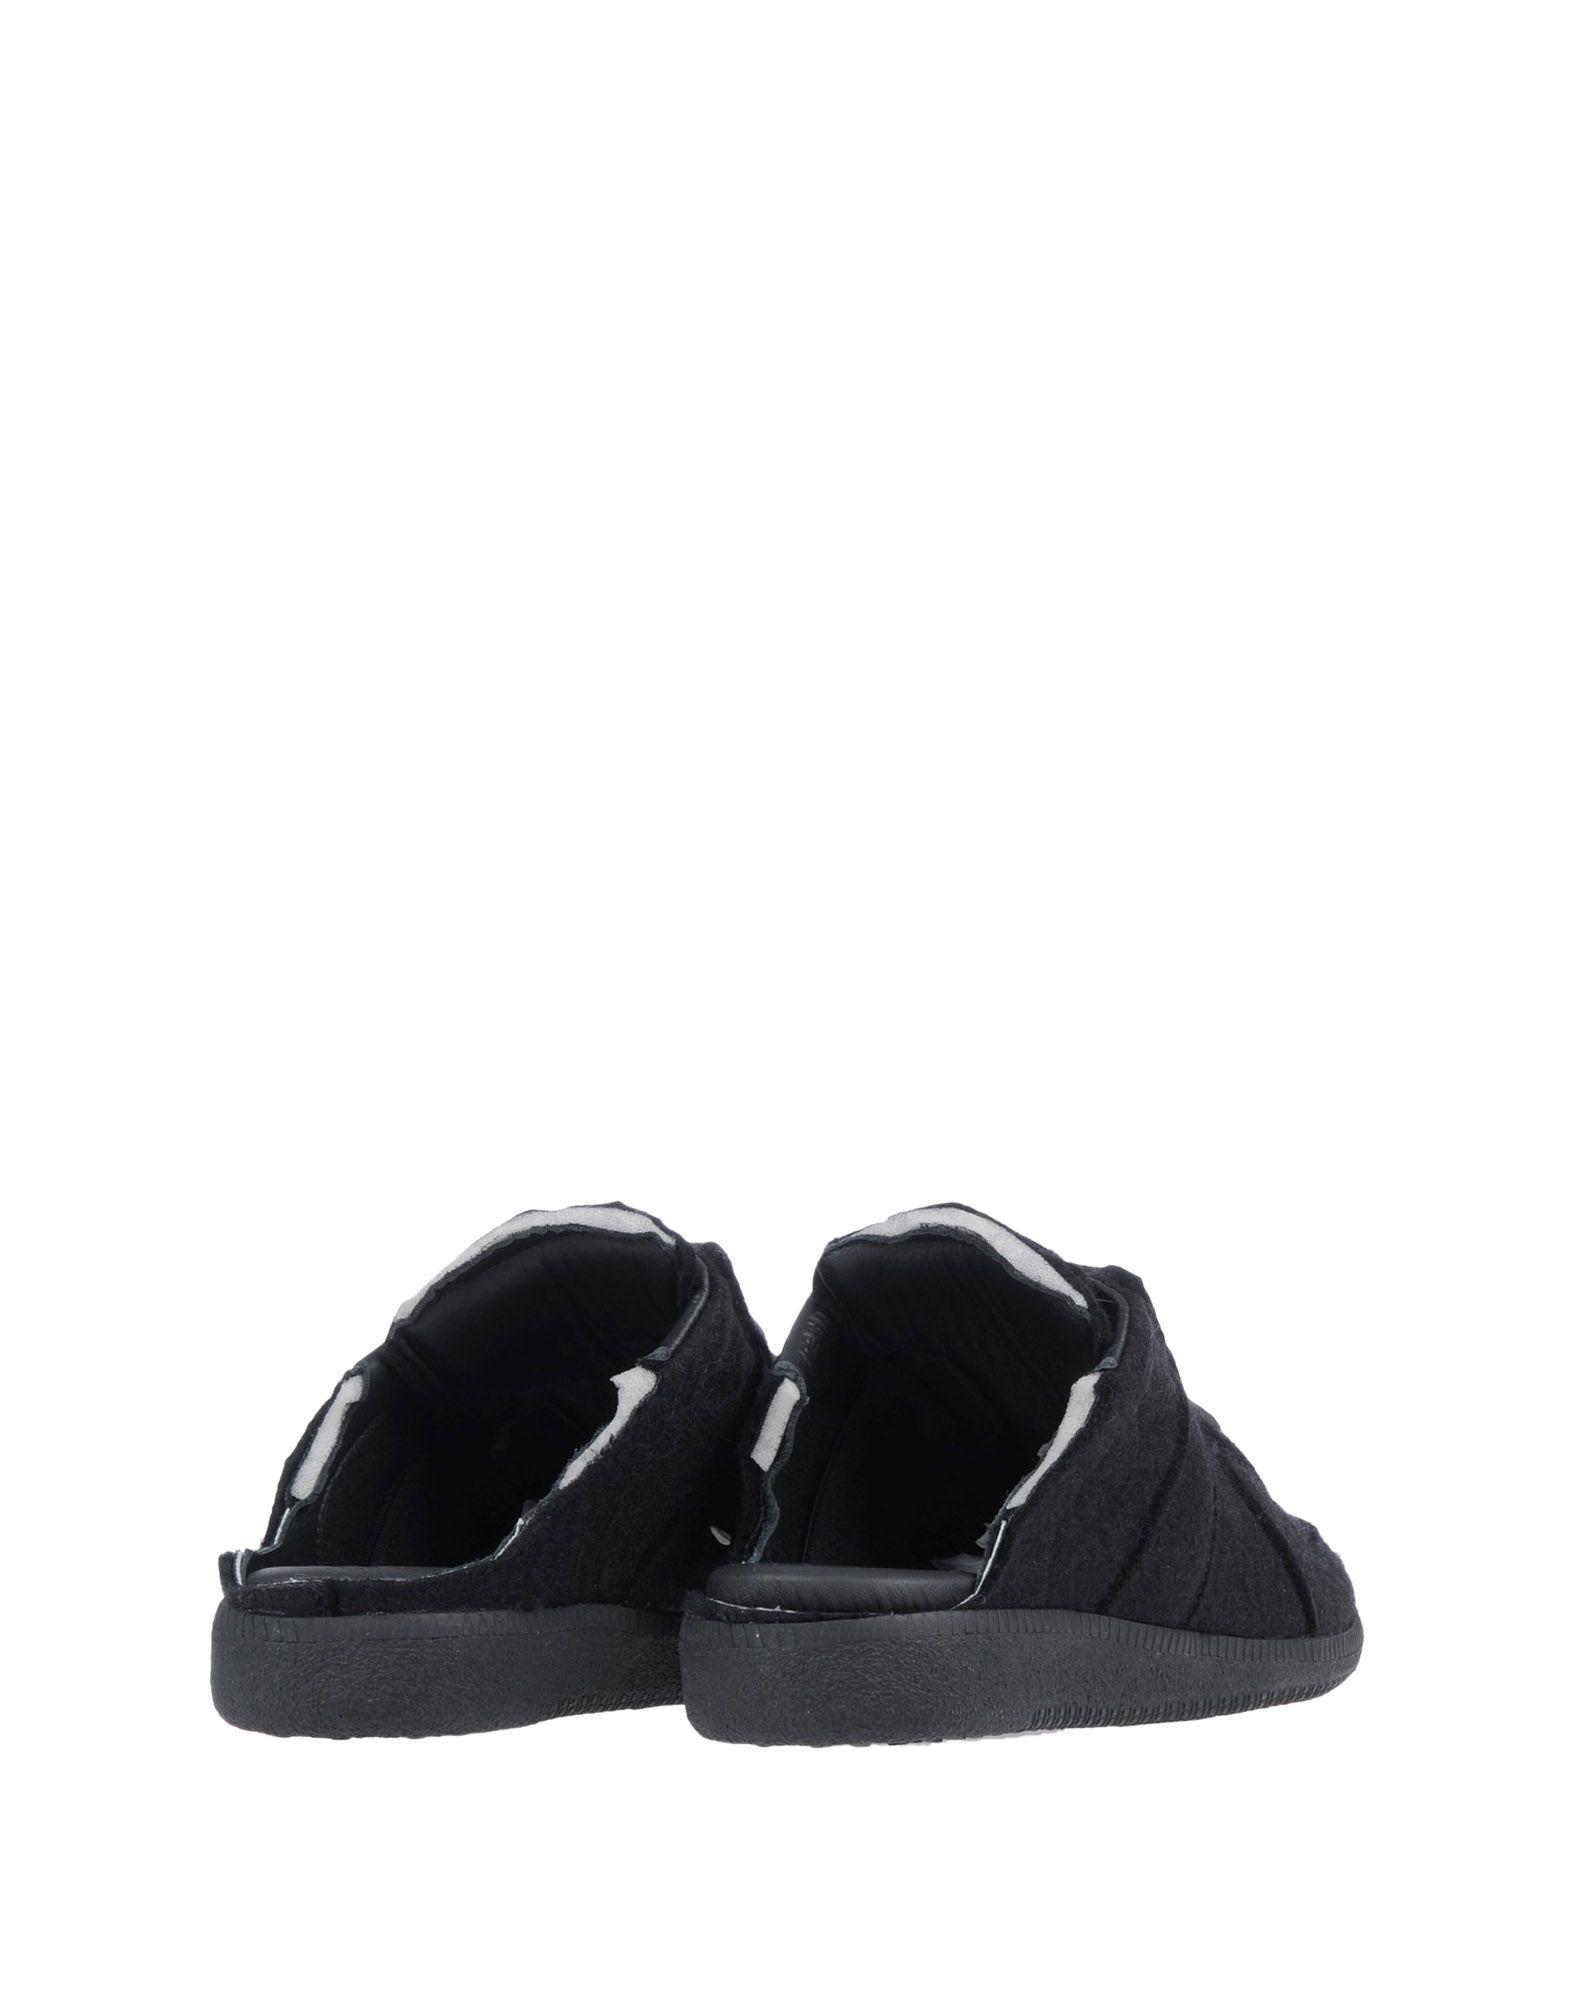 Rabatt Schuhe Maison Damen Margiela Pantoletten Damen Maison  11472124HO ab2a31